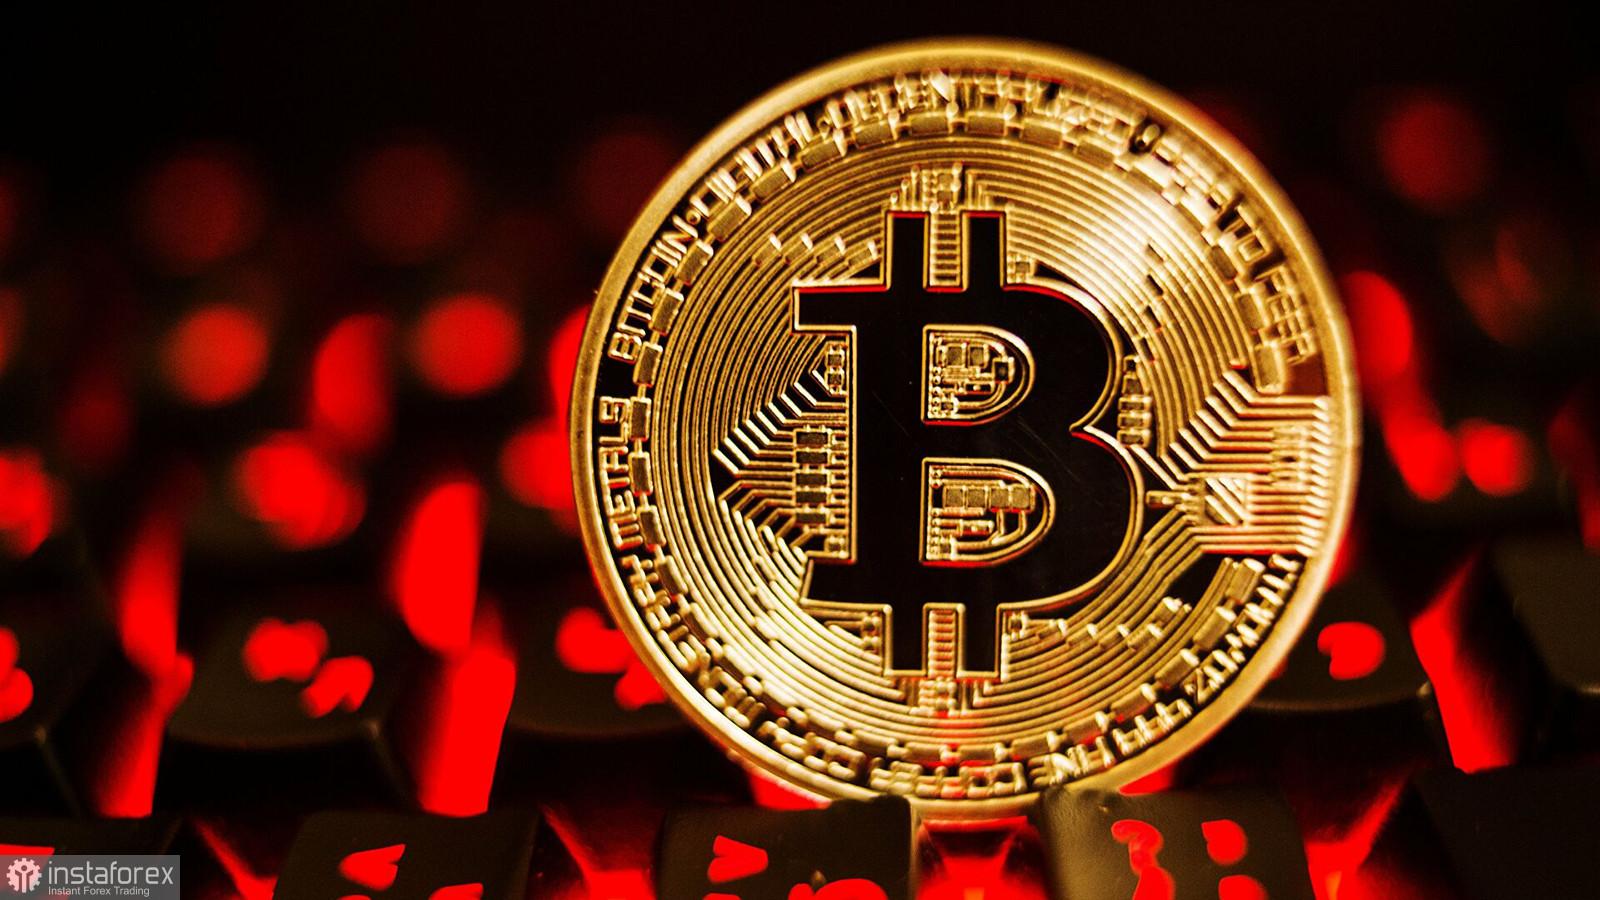 Bitcoin curs de tranzacționare